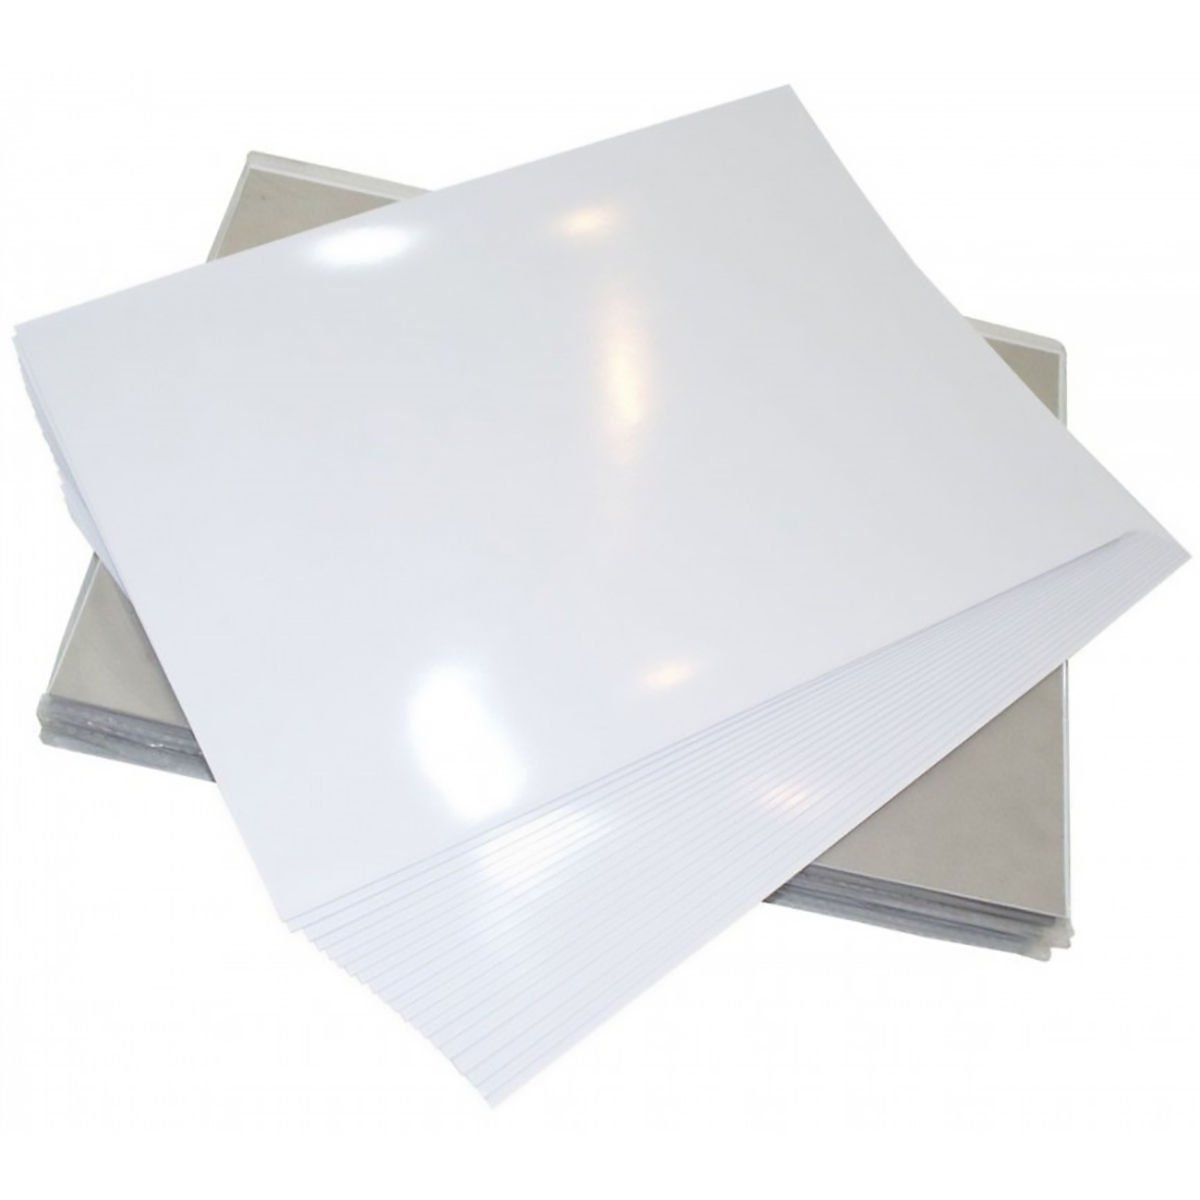 0fbde4705 Papel Fotográfico A3 297mm x 420mm 230g Glossy Photo Paper Branco Brilhante  Resistente à Água ...